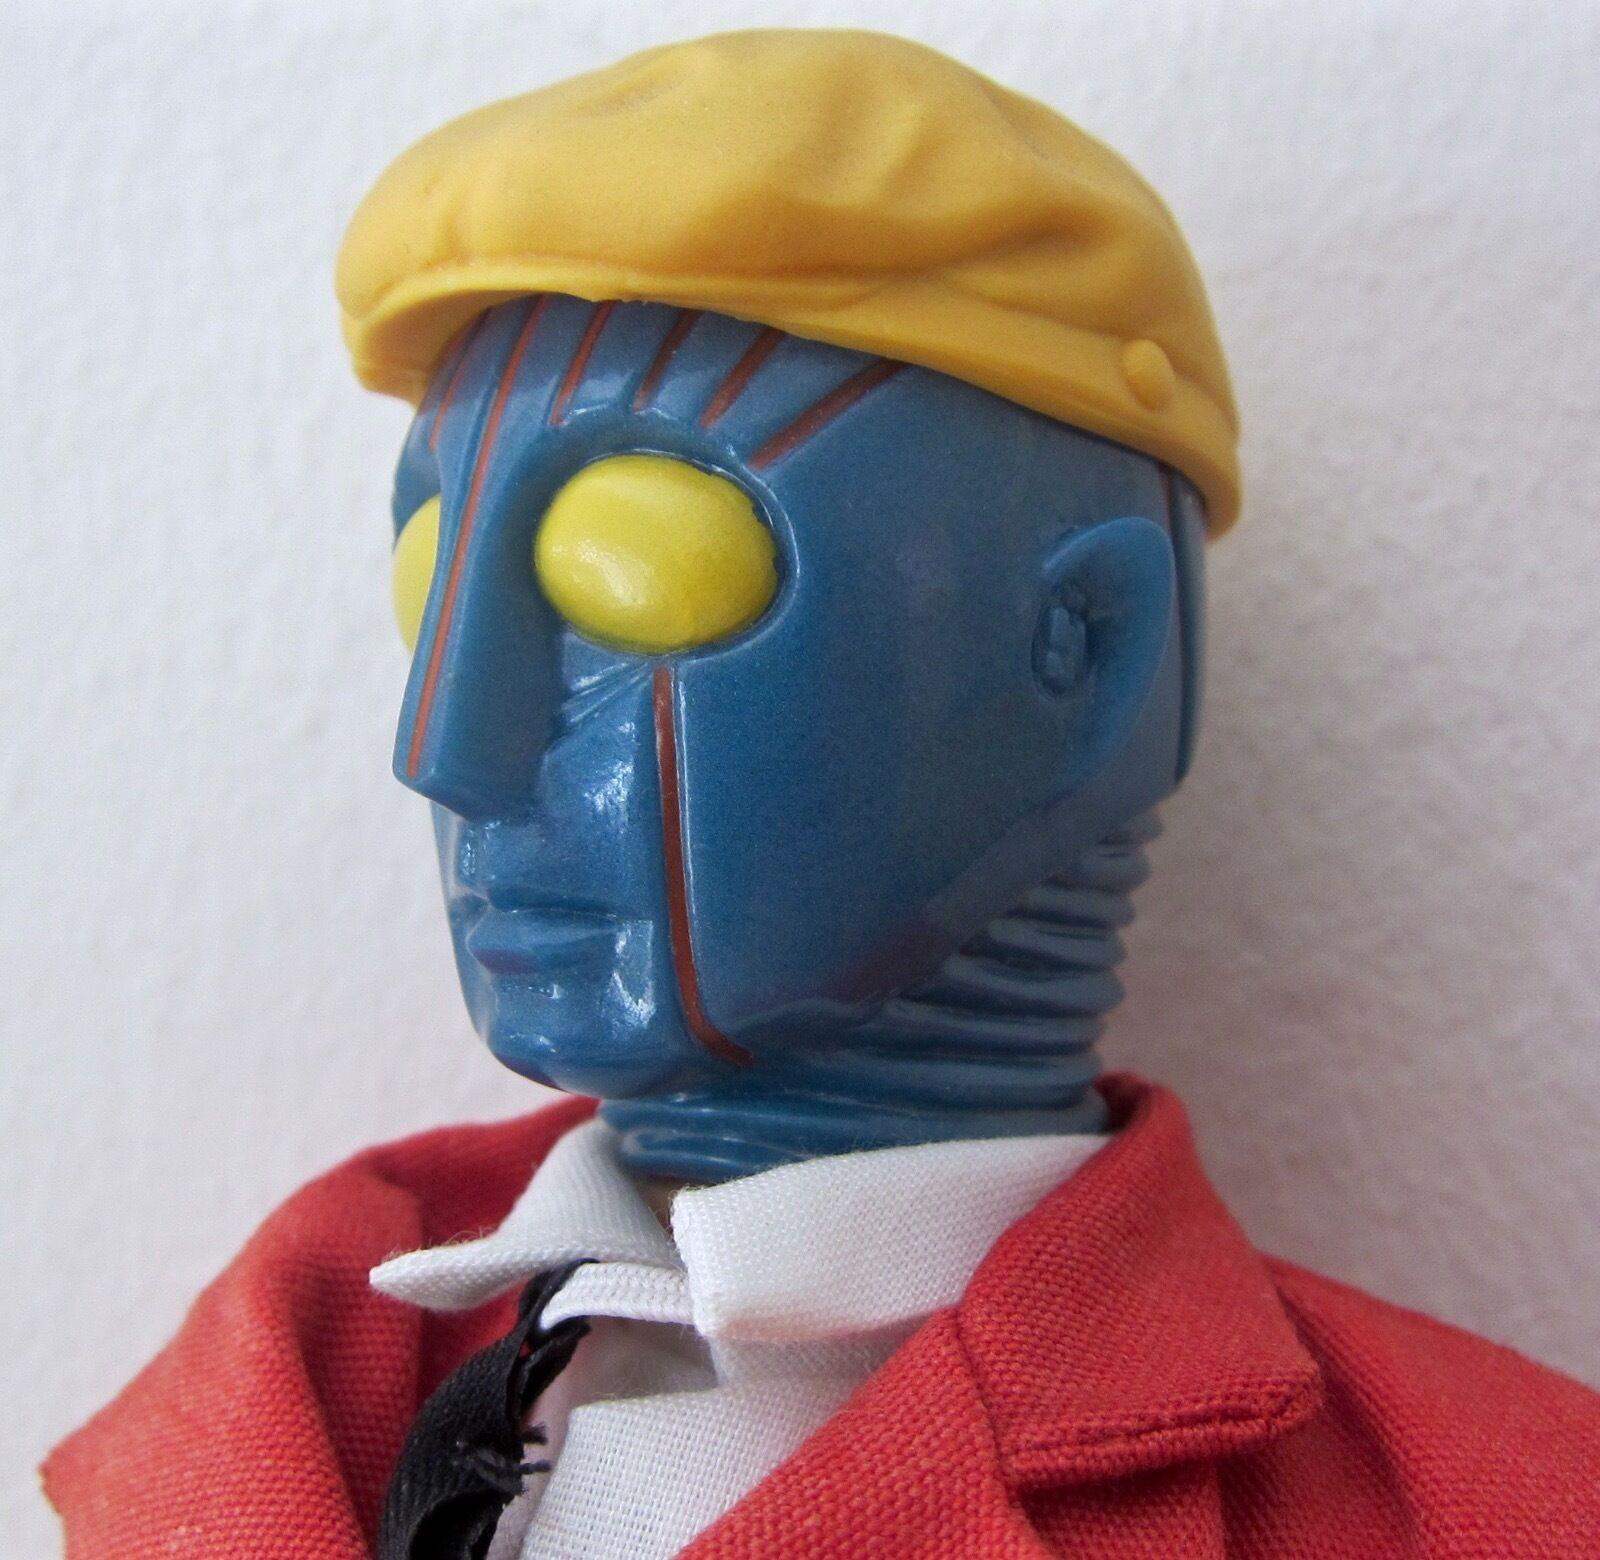 ROBOT DETECTIVE K. Roboto Keiji. MEDICOM RAH 043. BELLA condizione.